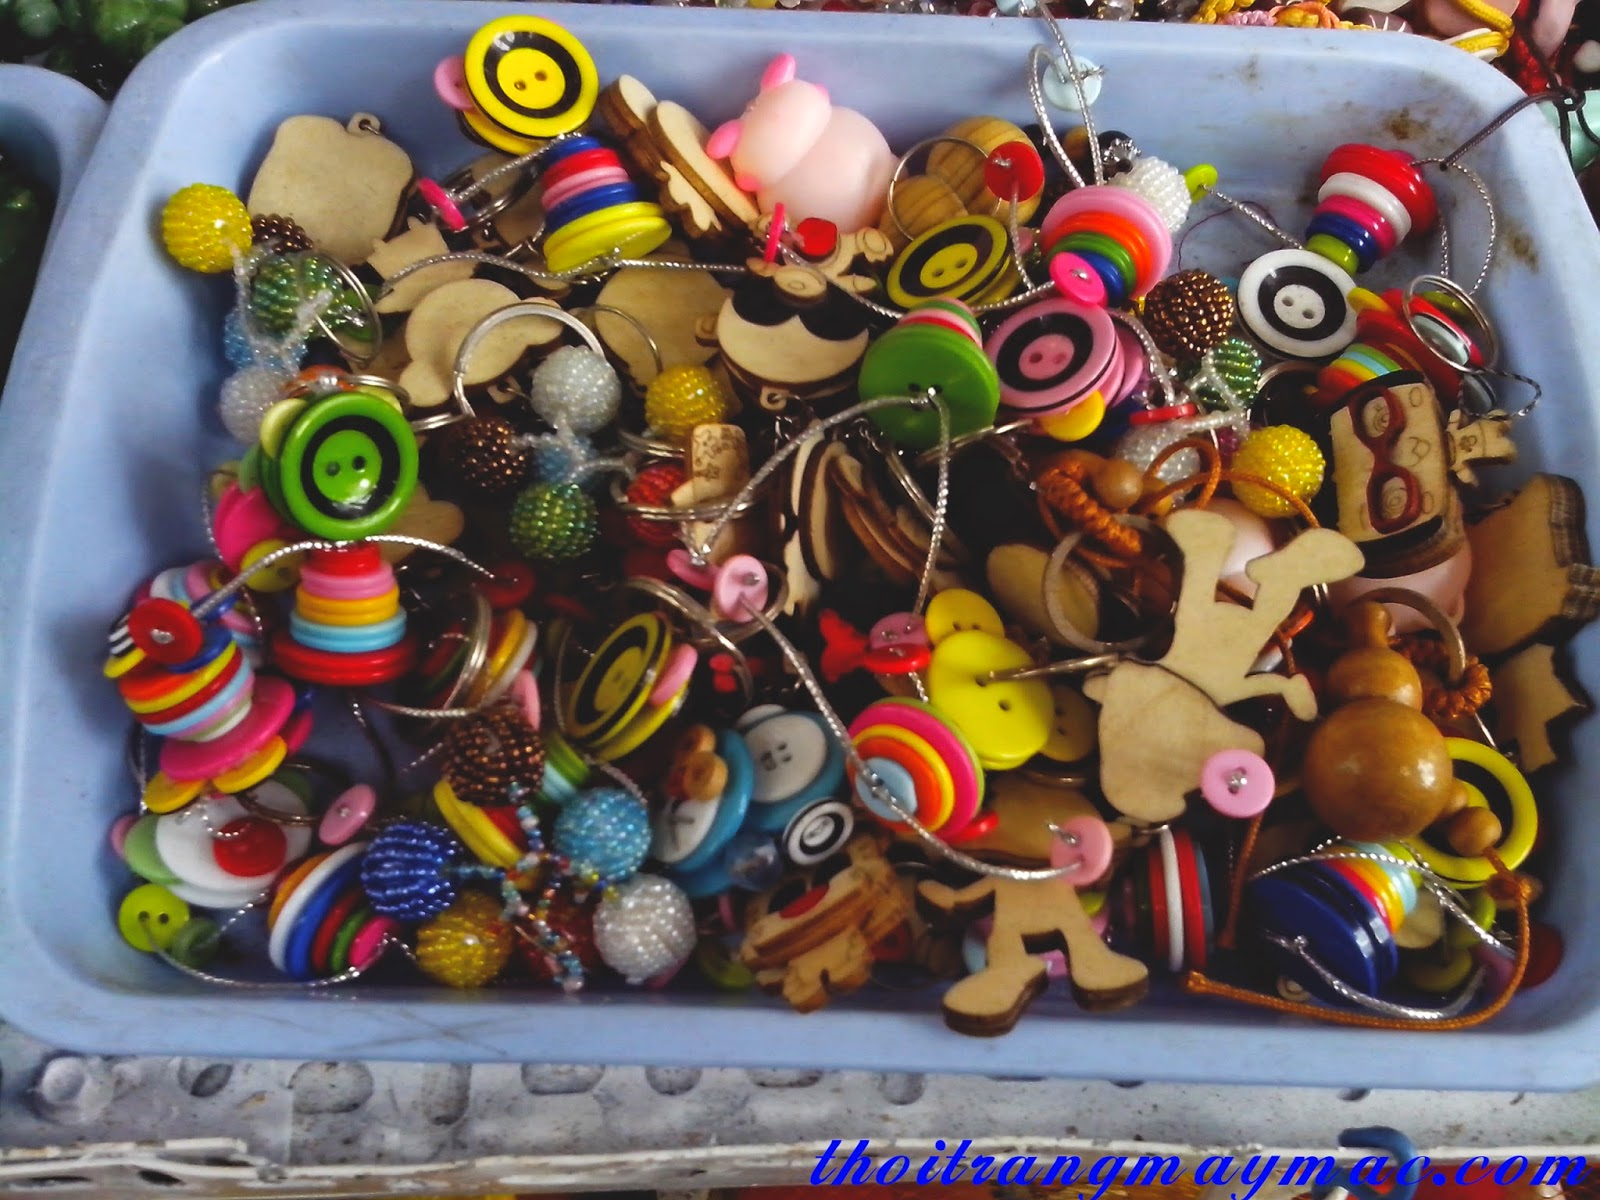 nguyen-phu-lieu-may-mac-lam-moc-khoa-handmade-bang-nut-kieu-thoi-trang